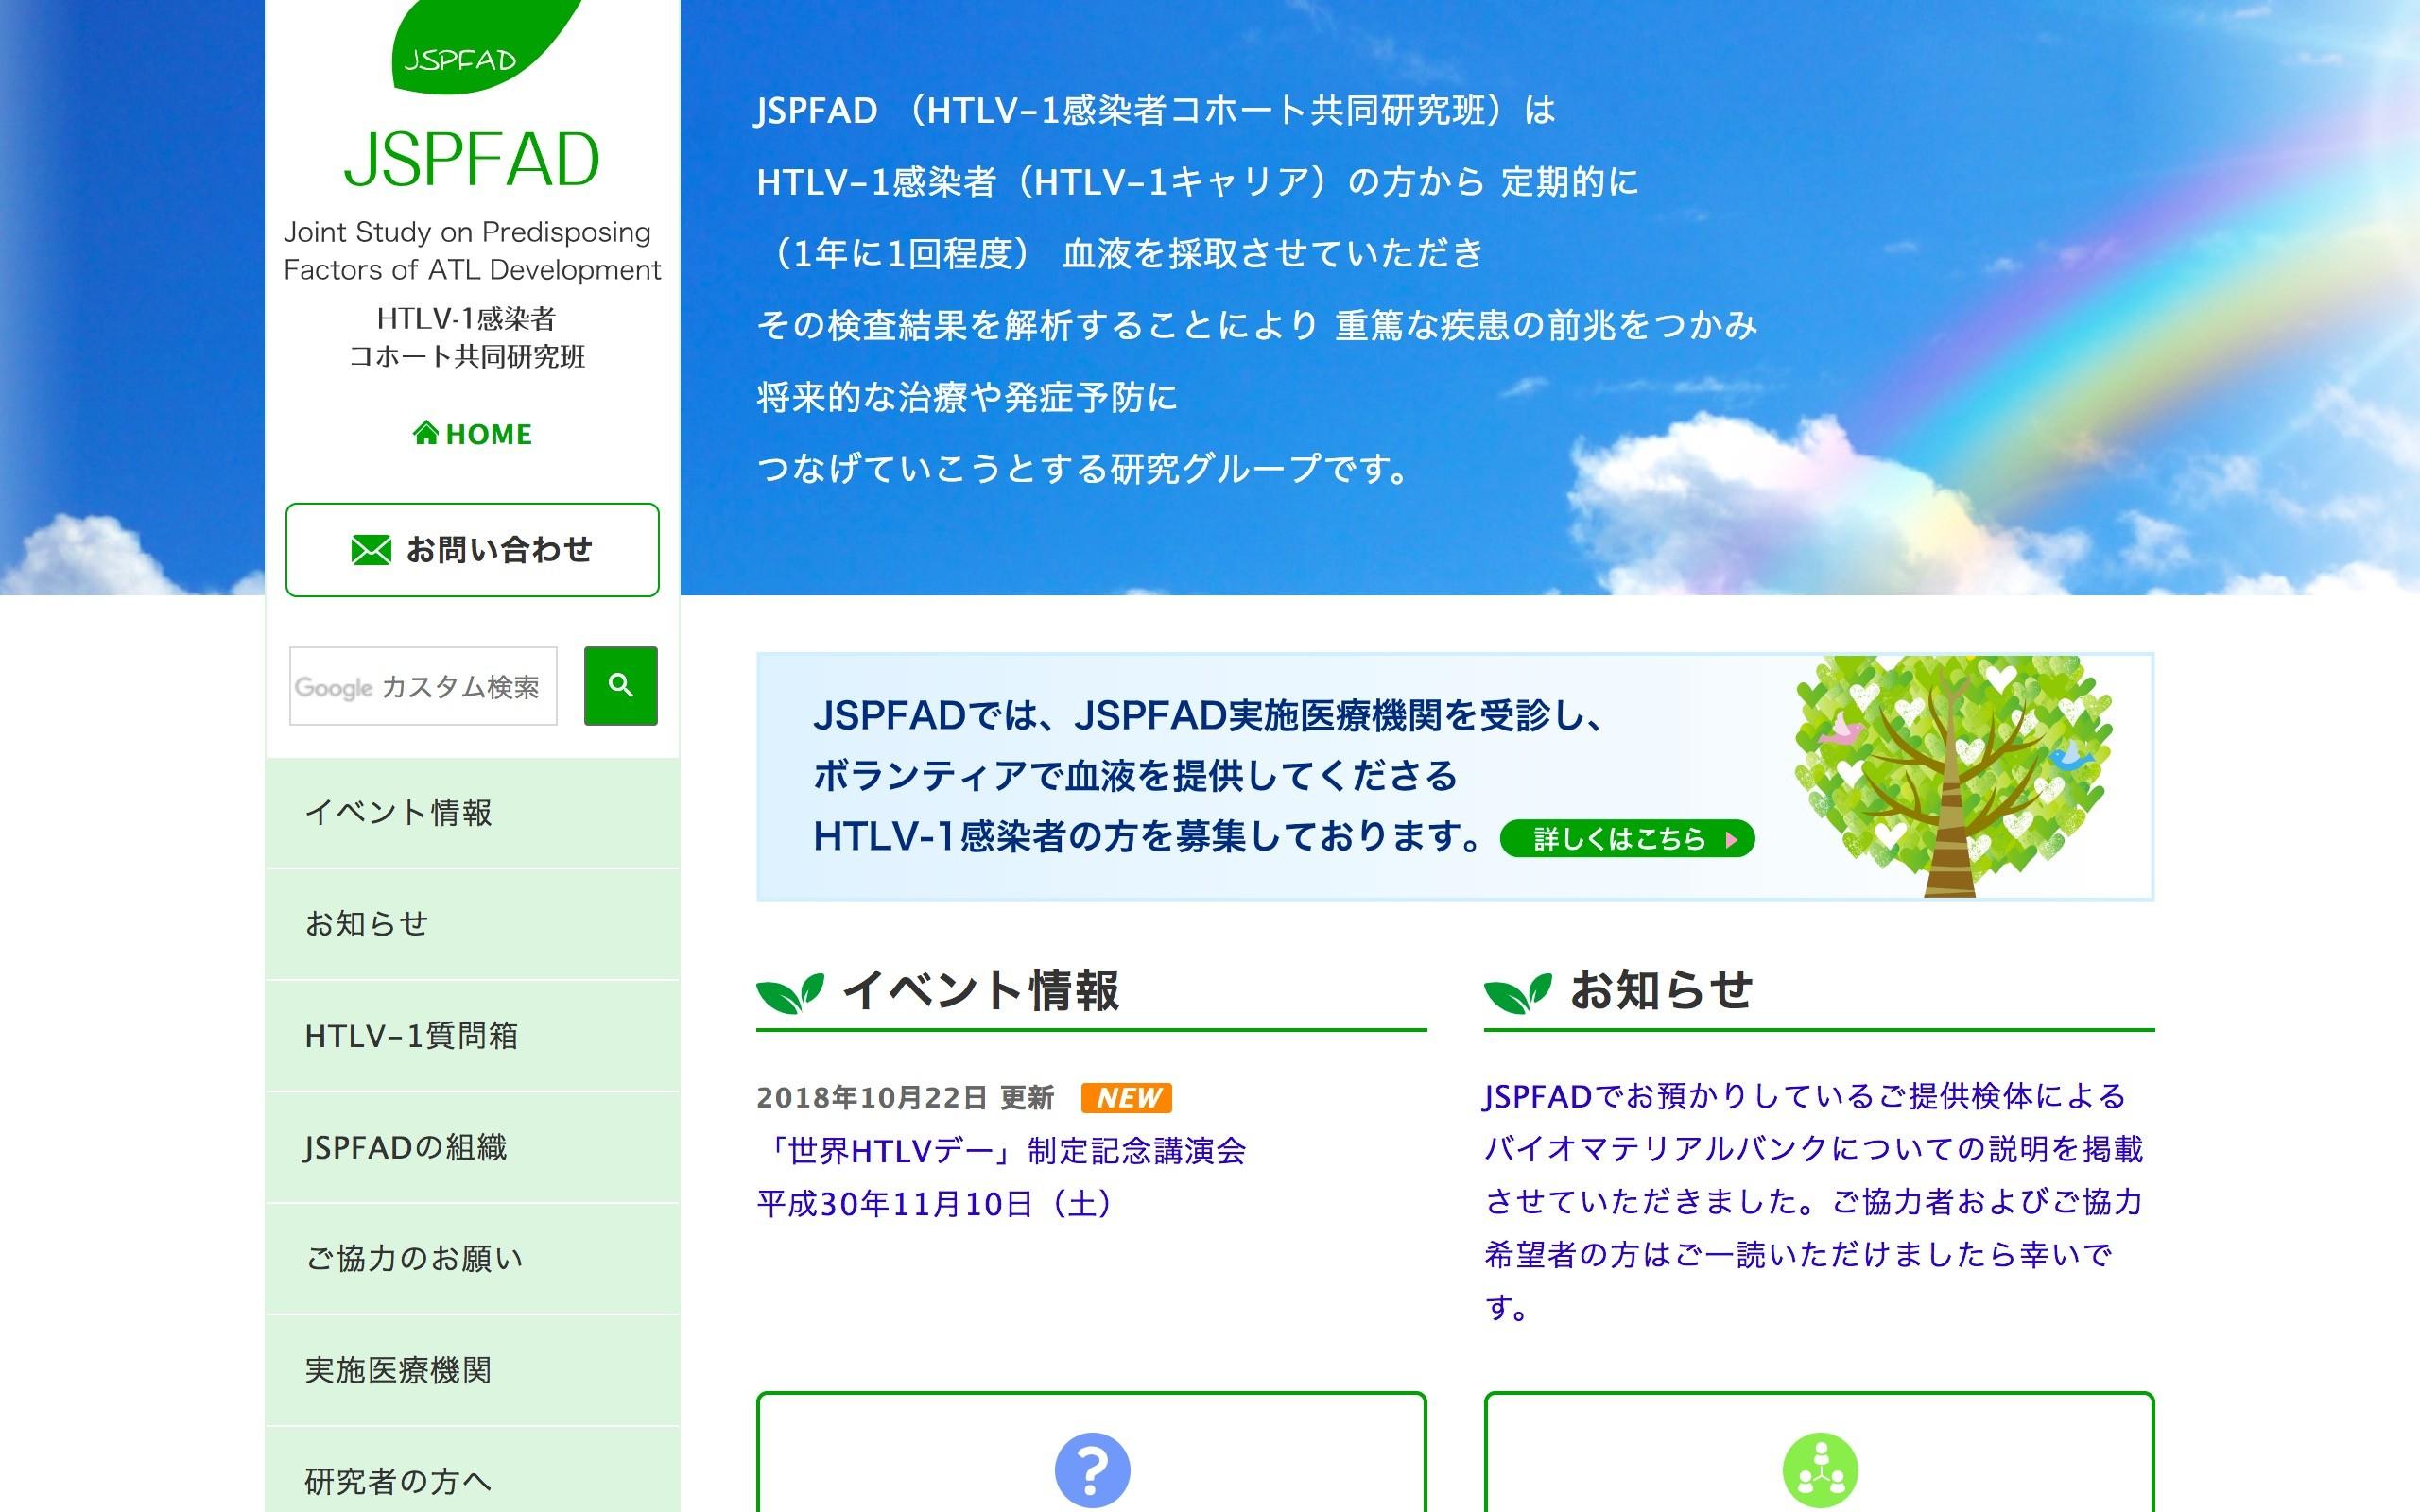 JSPFAD(HTLV-1感染者コホート共同研究班)